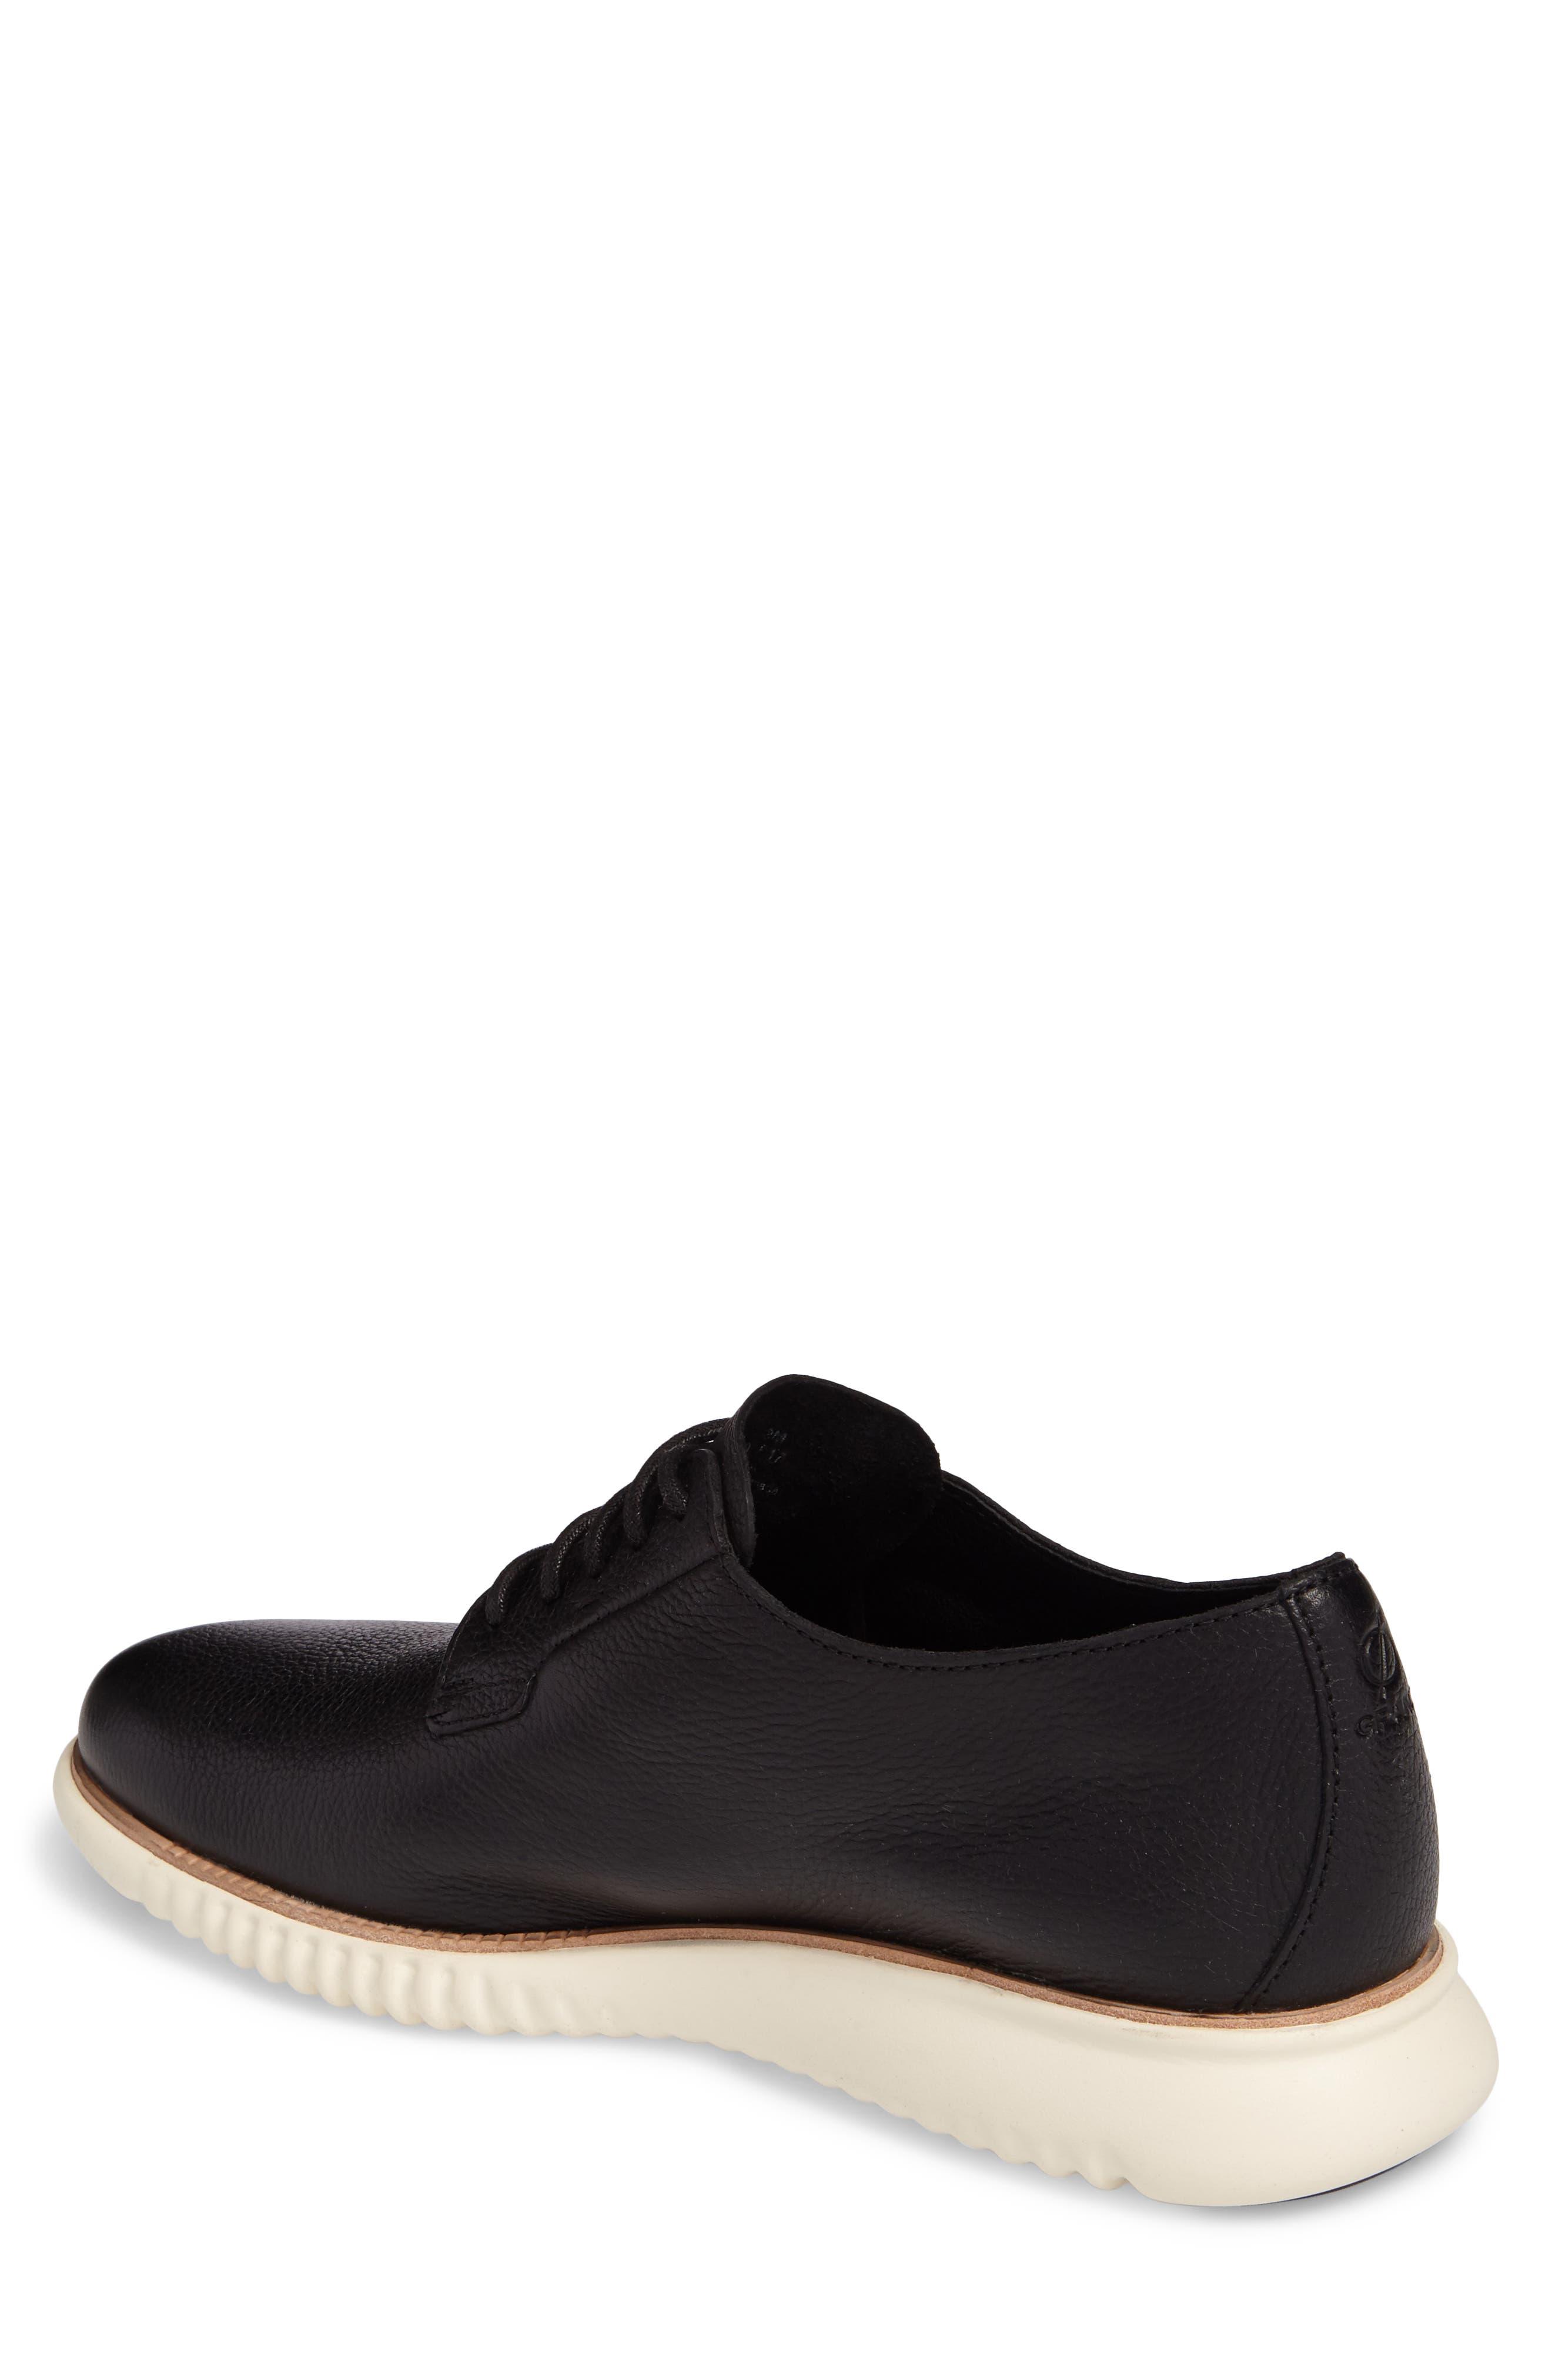 2.ZeroGrand Plain Toe Derby,                             Alternate thumbnail 2, color,                             Black/ Ivory Leather